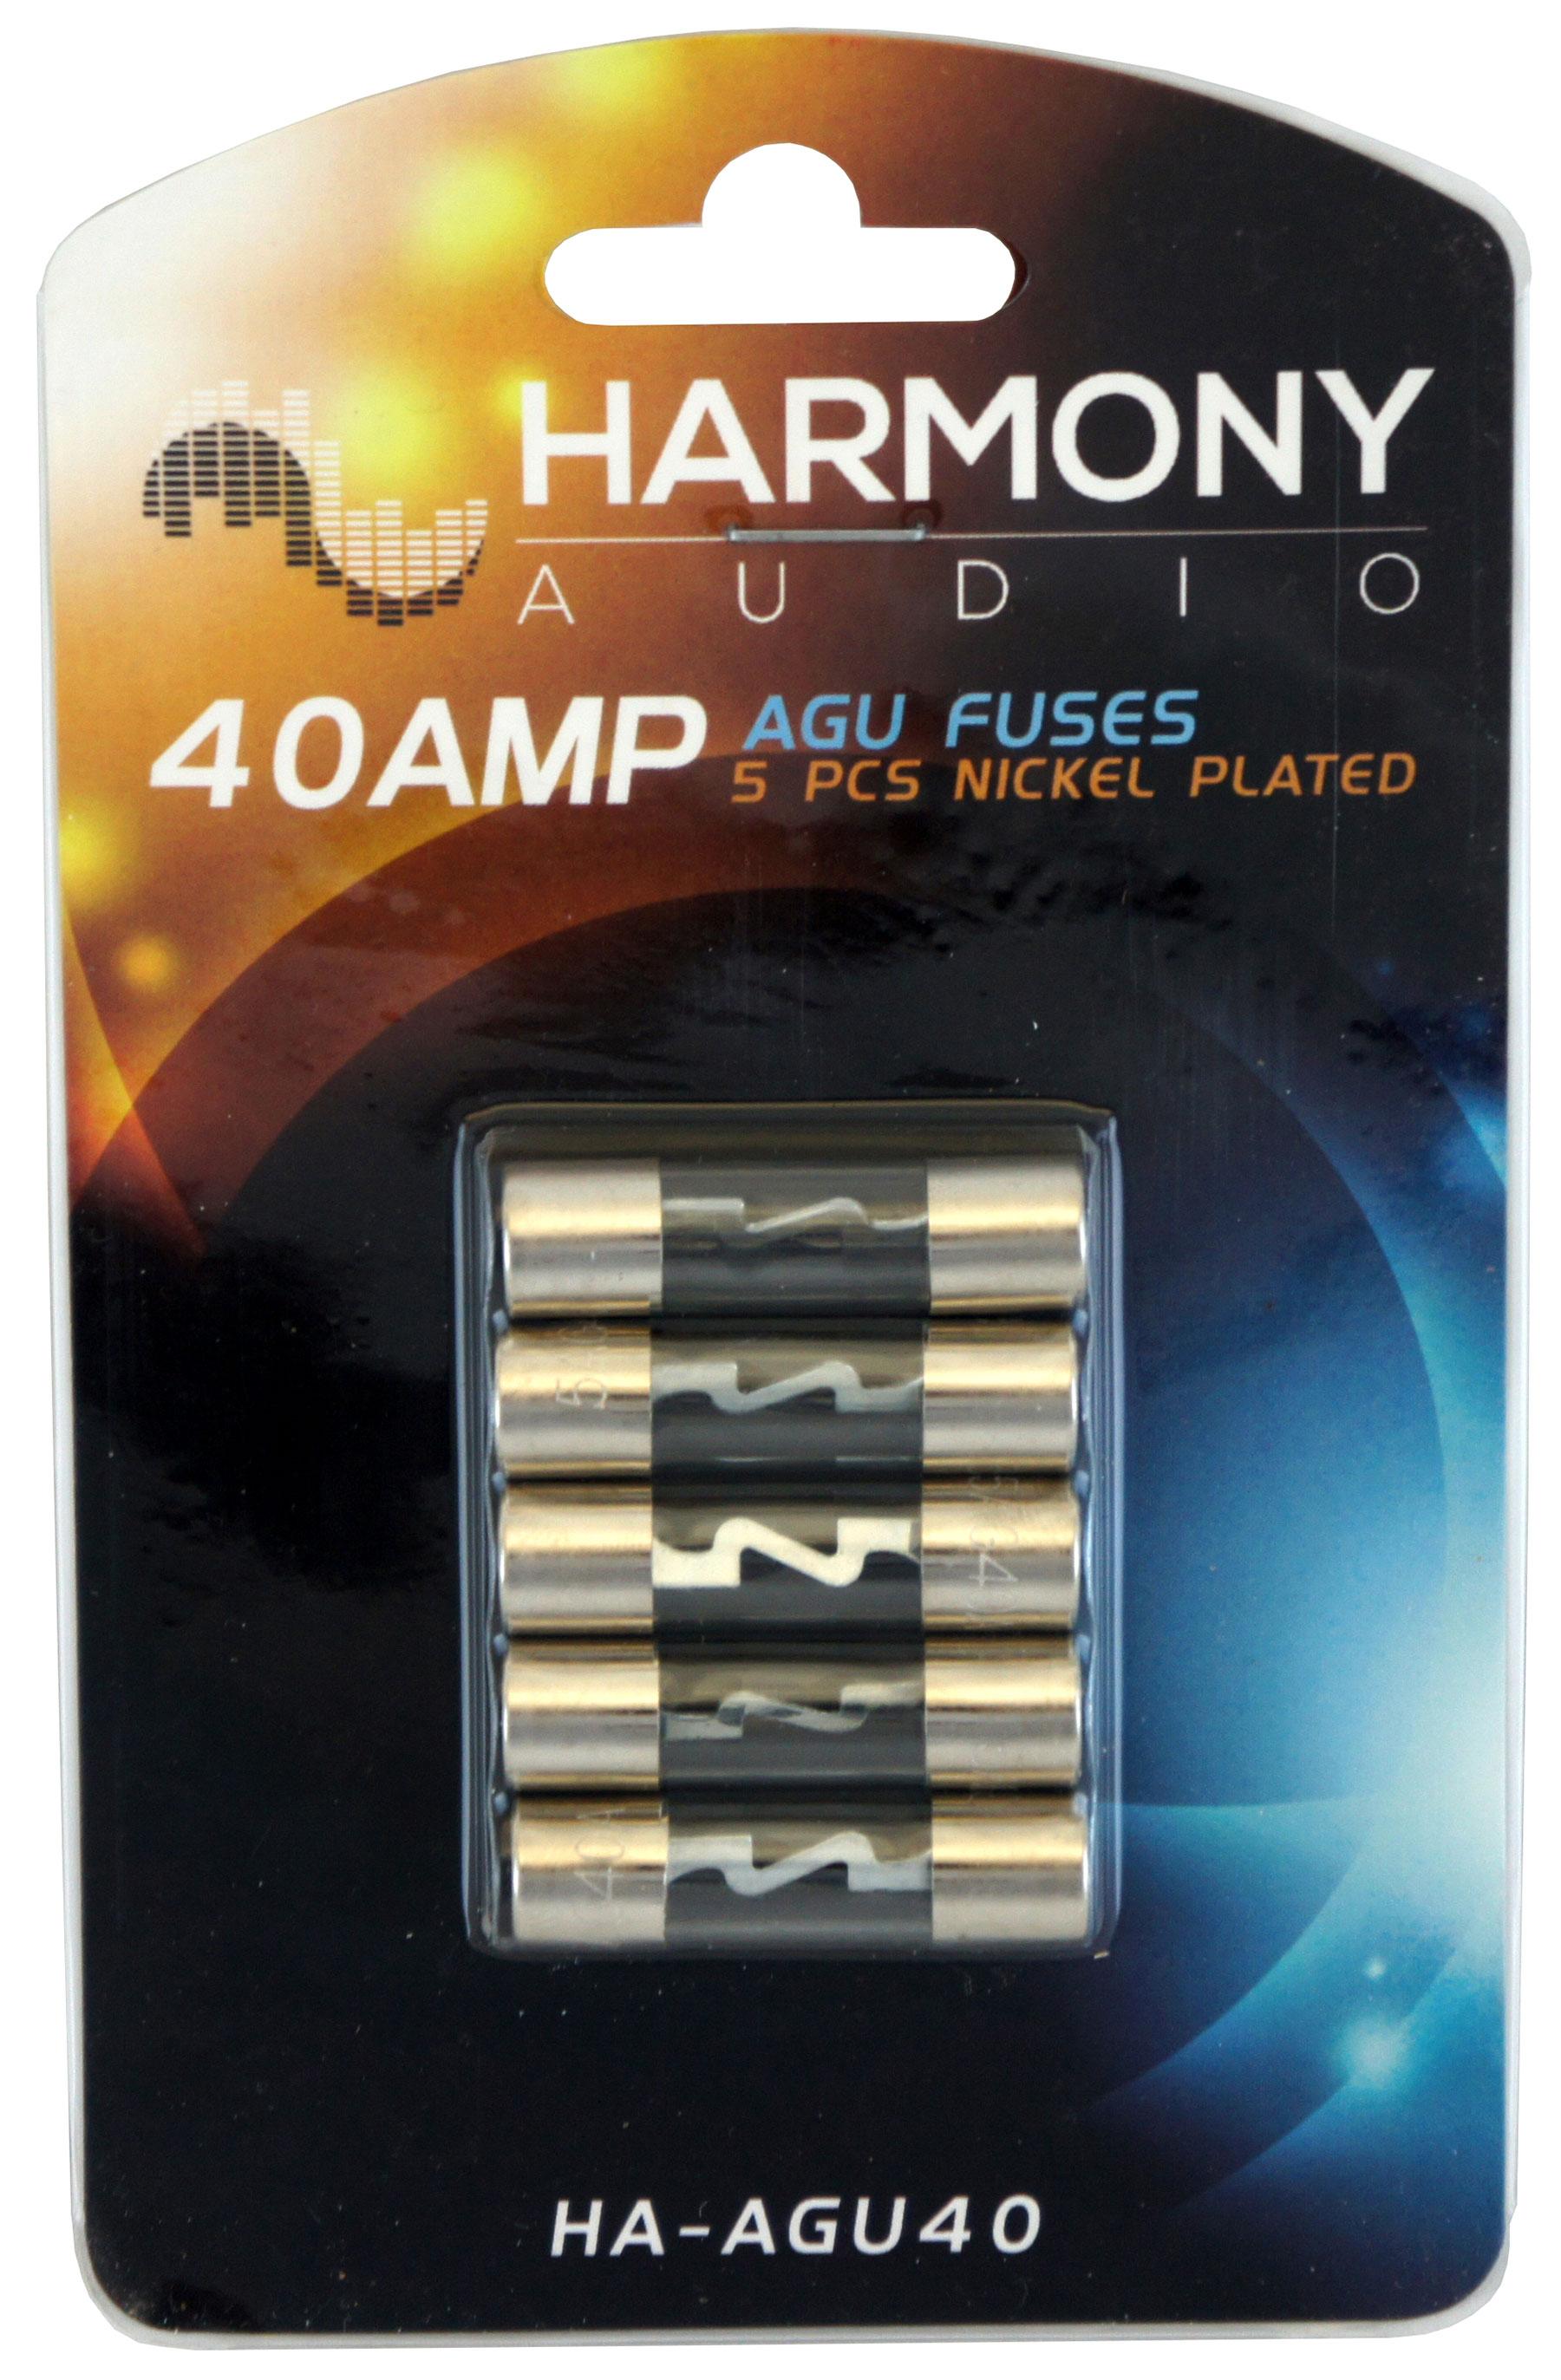 Harmony Audio HA-AGU40 Car Stereo Fuseholder 5 Pack 40 Amp AGU Fuses - Nickel